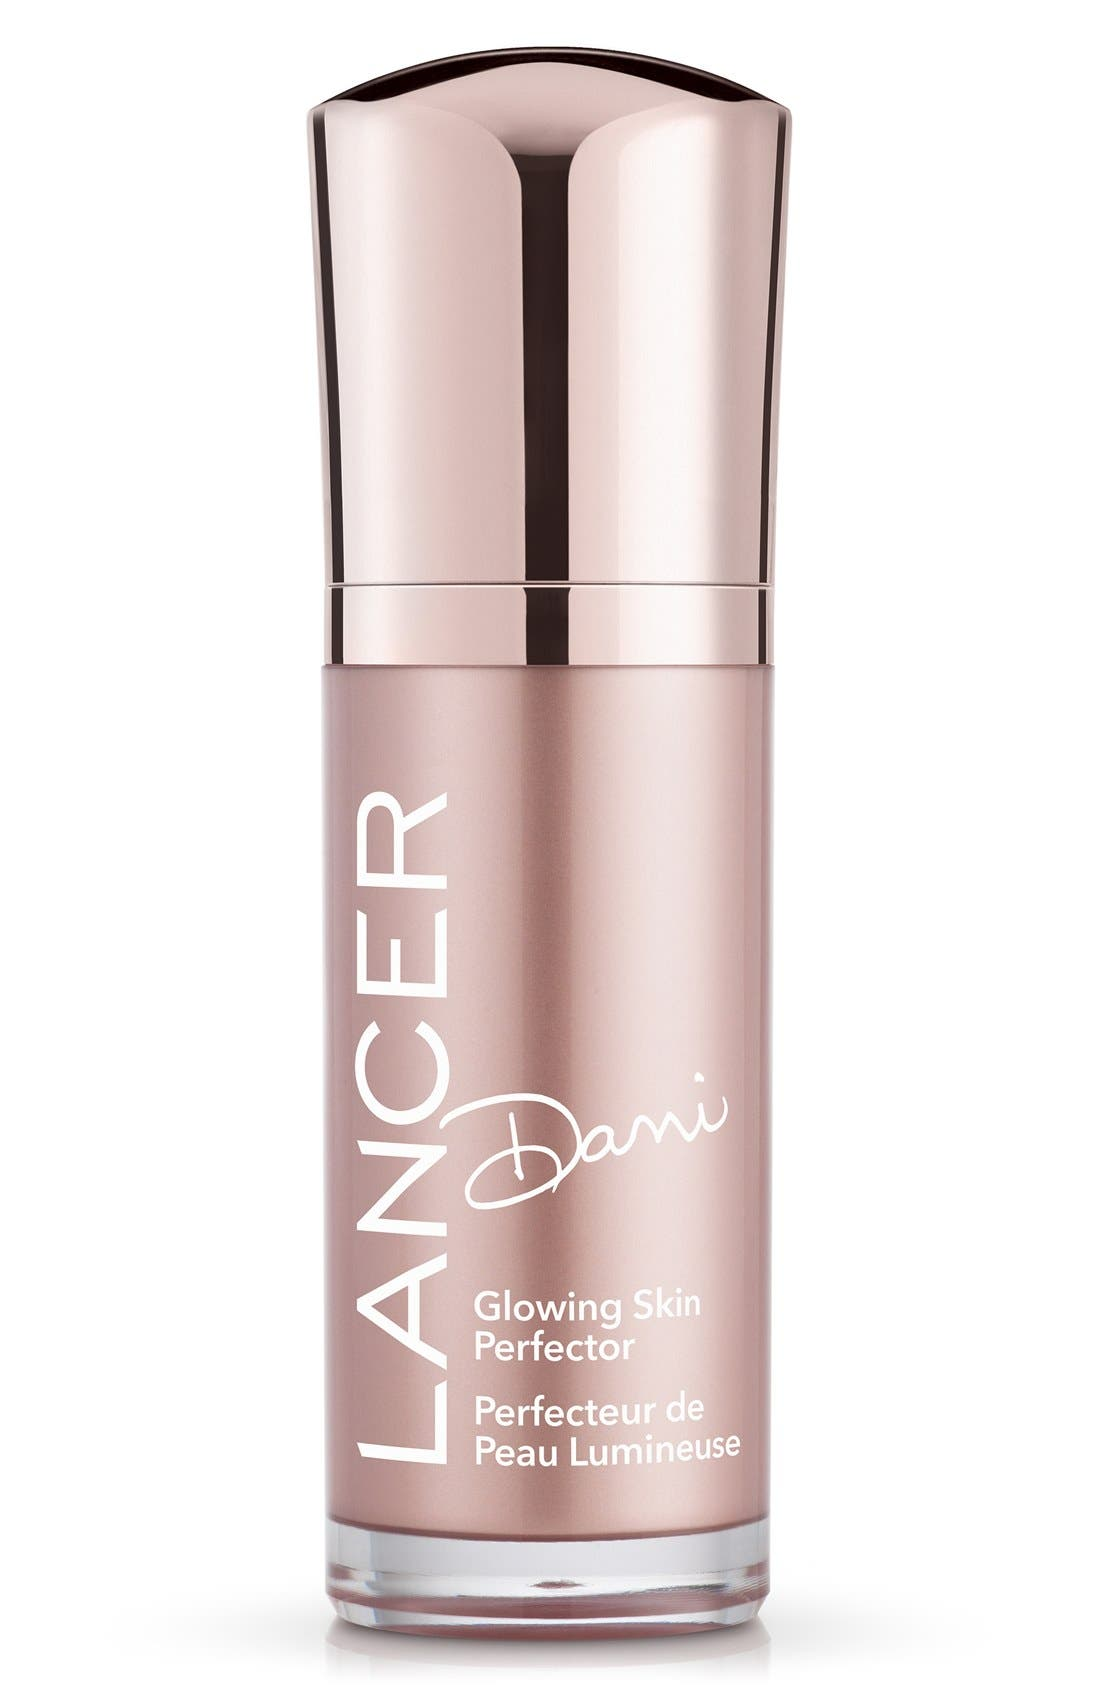 Dani Glowing Skin Perfector,                             Main thumbnail 1, color,                             NO COLOR